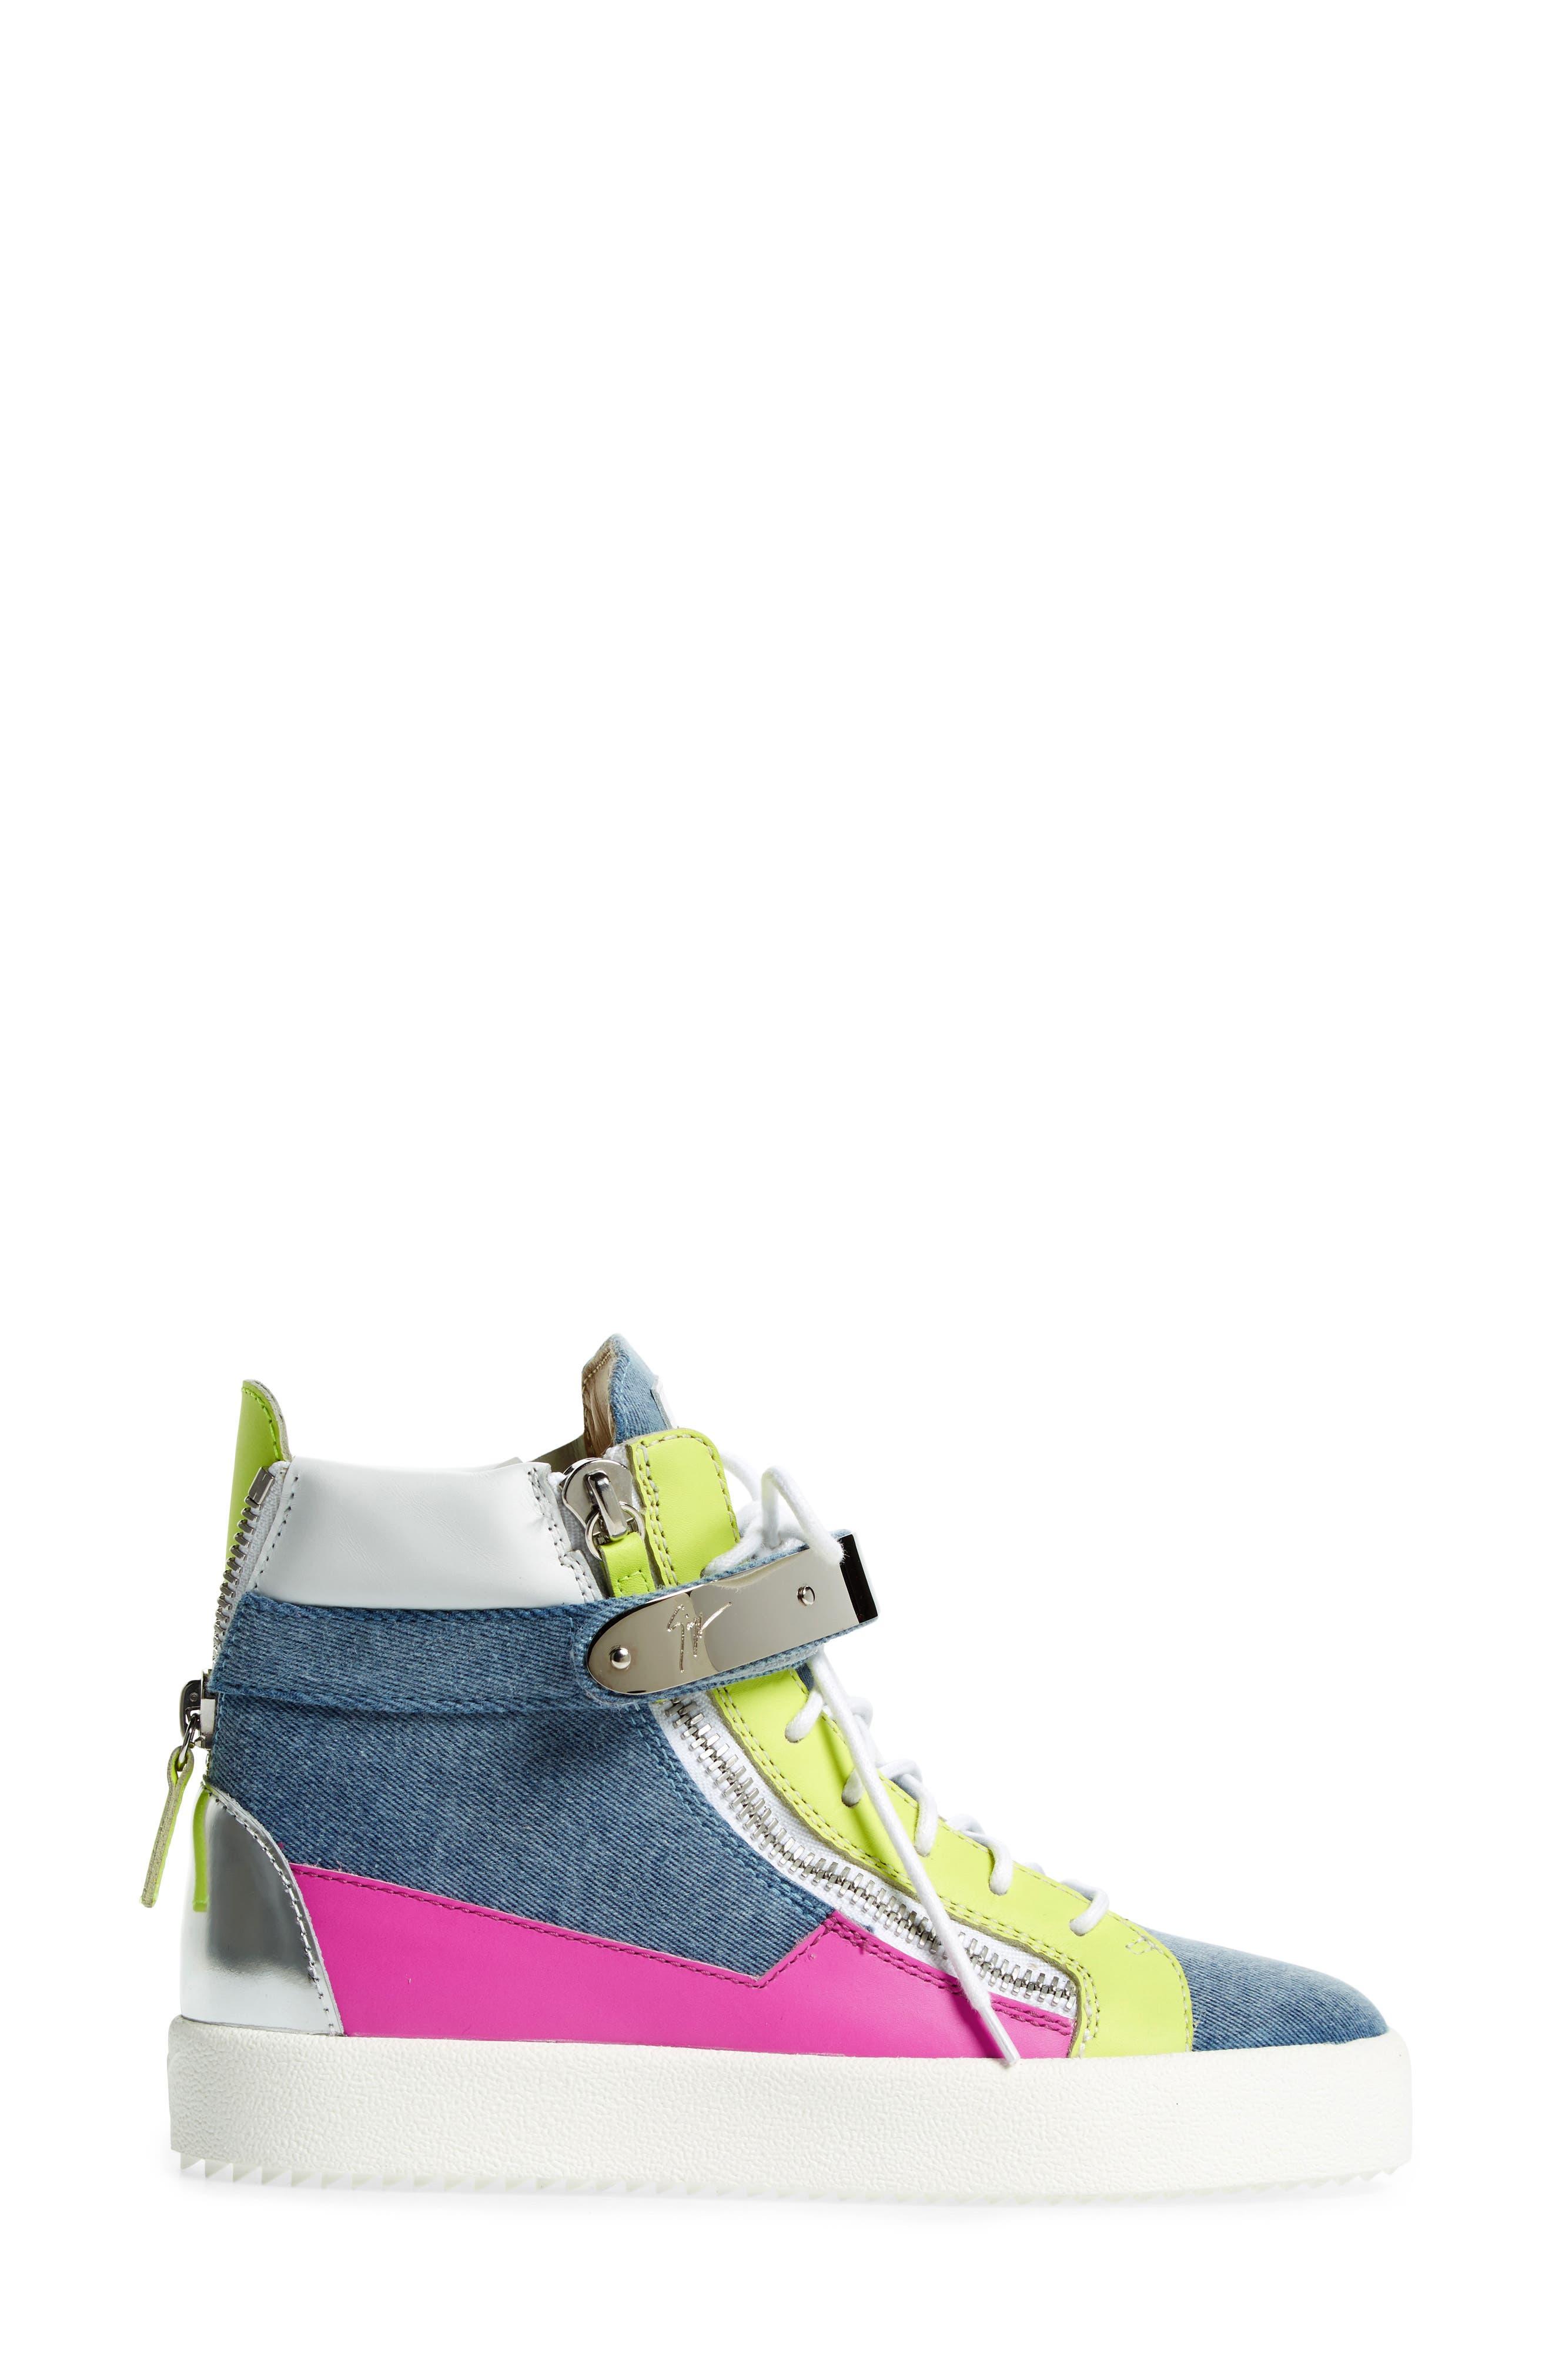 May London High Top Sneaker,                             Alternate thumbnail 3, color,                             400